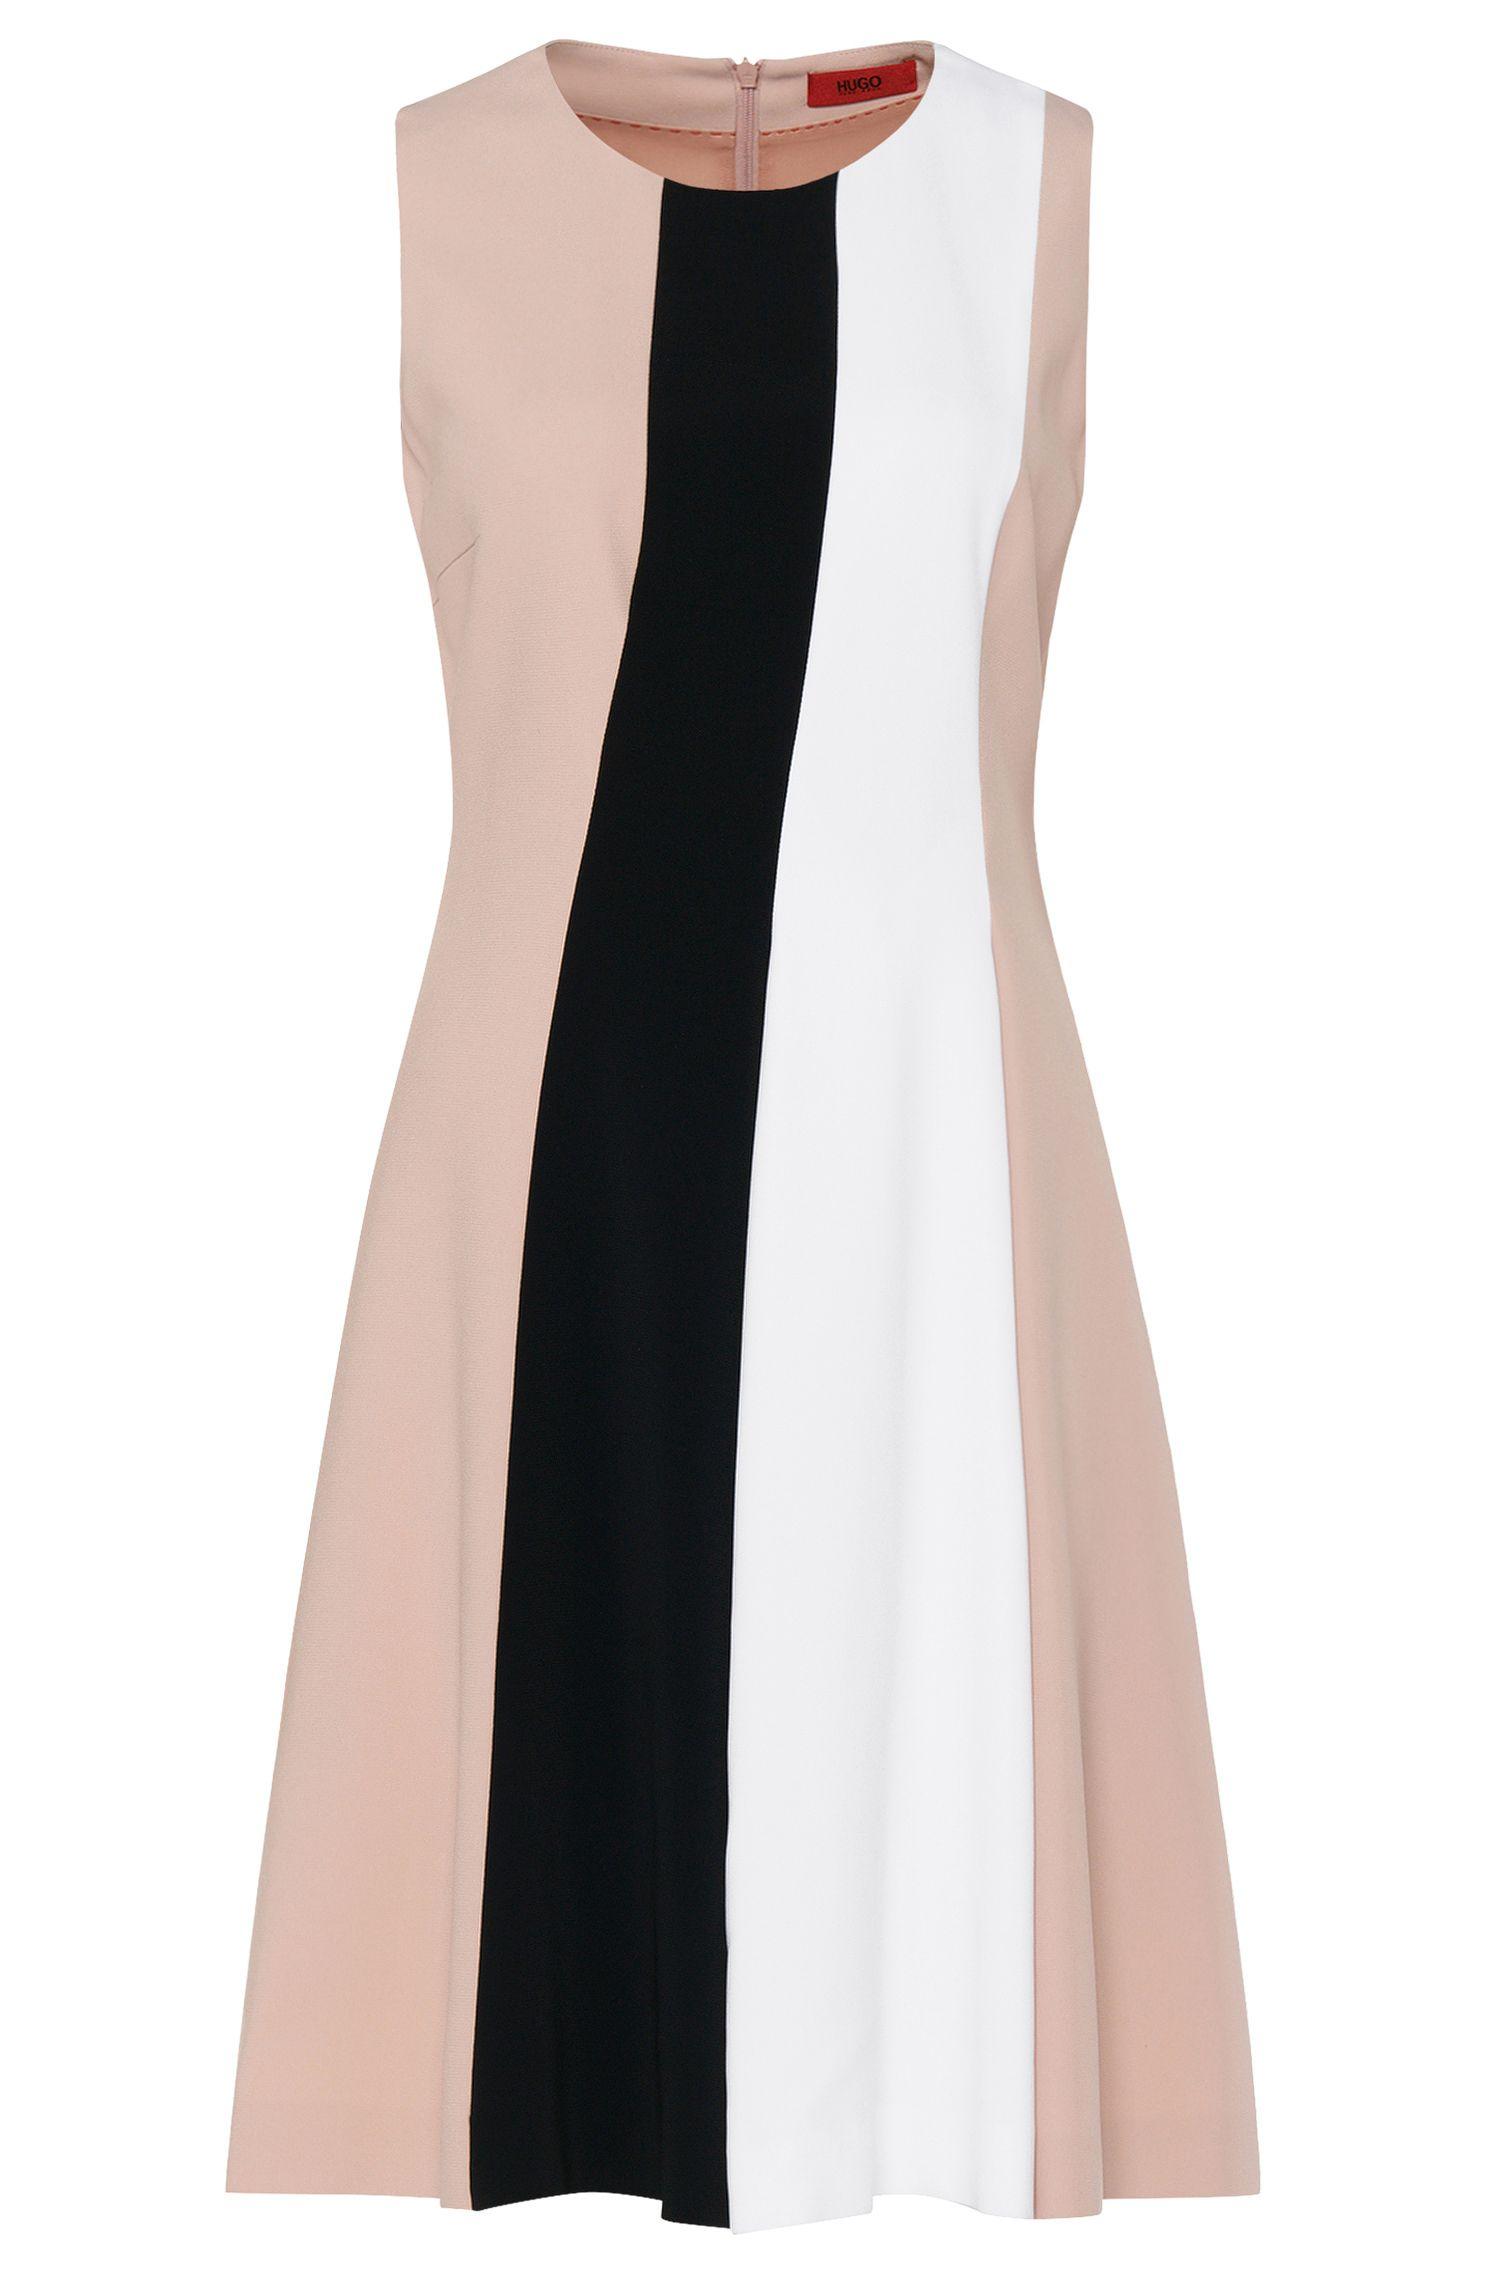 'Kilata' | Stretch Viscose Colorblock Dress